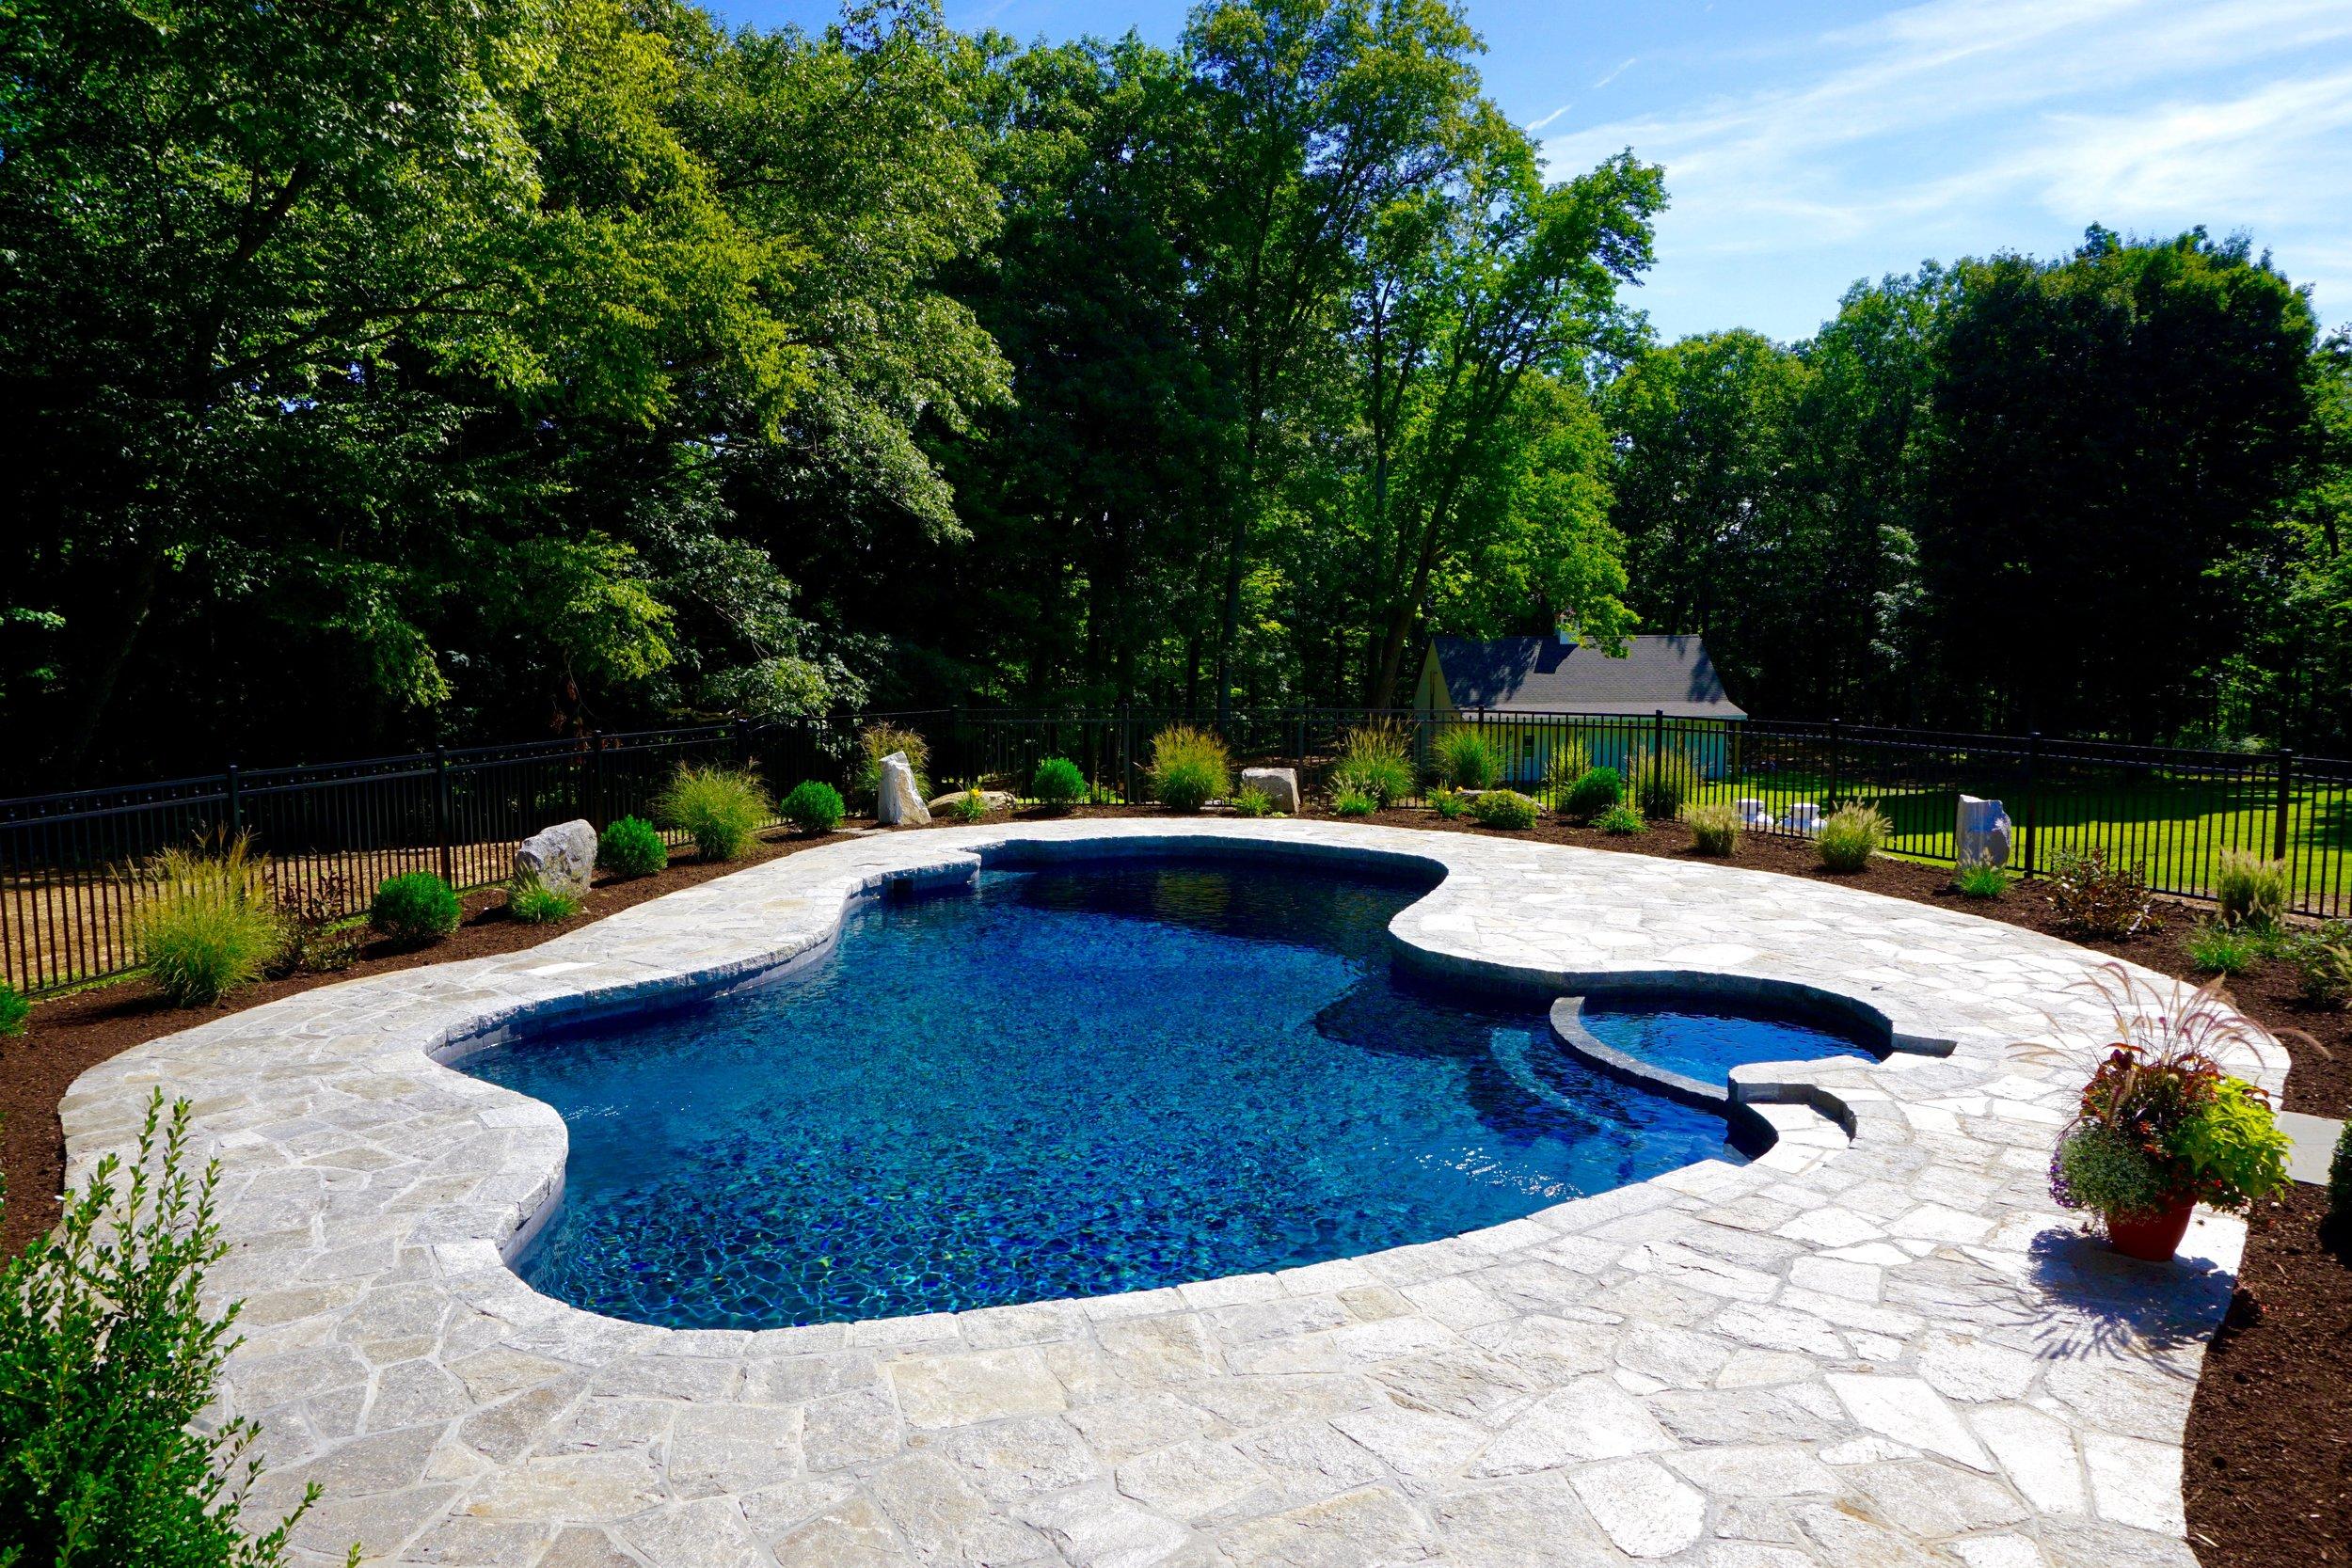 In-ground free form custom gunite swimming pool